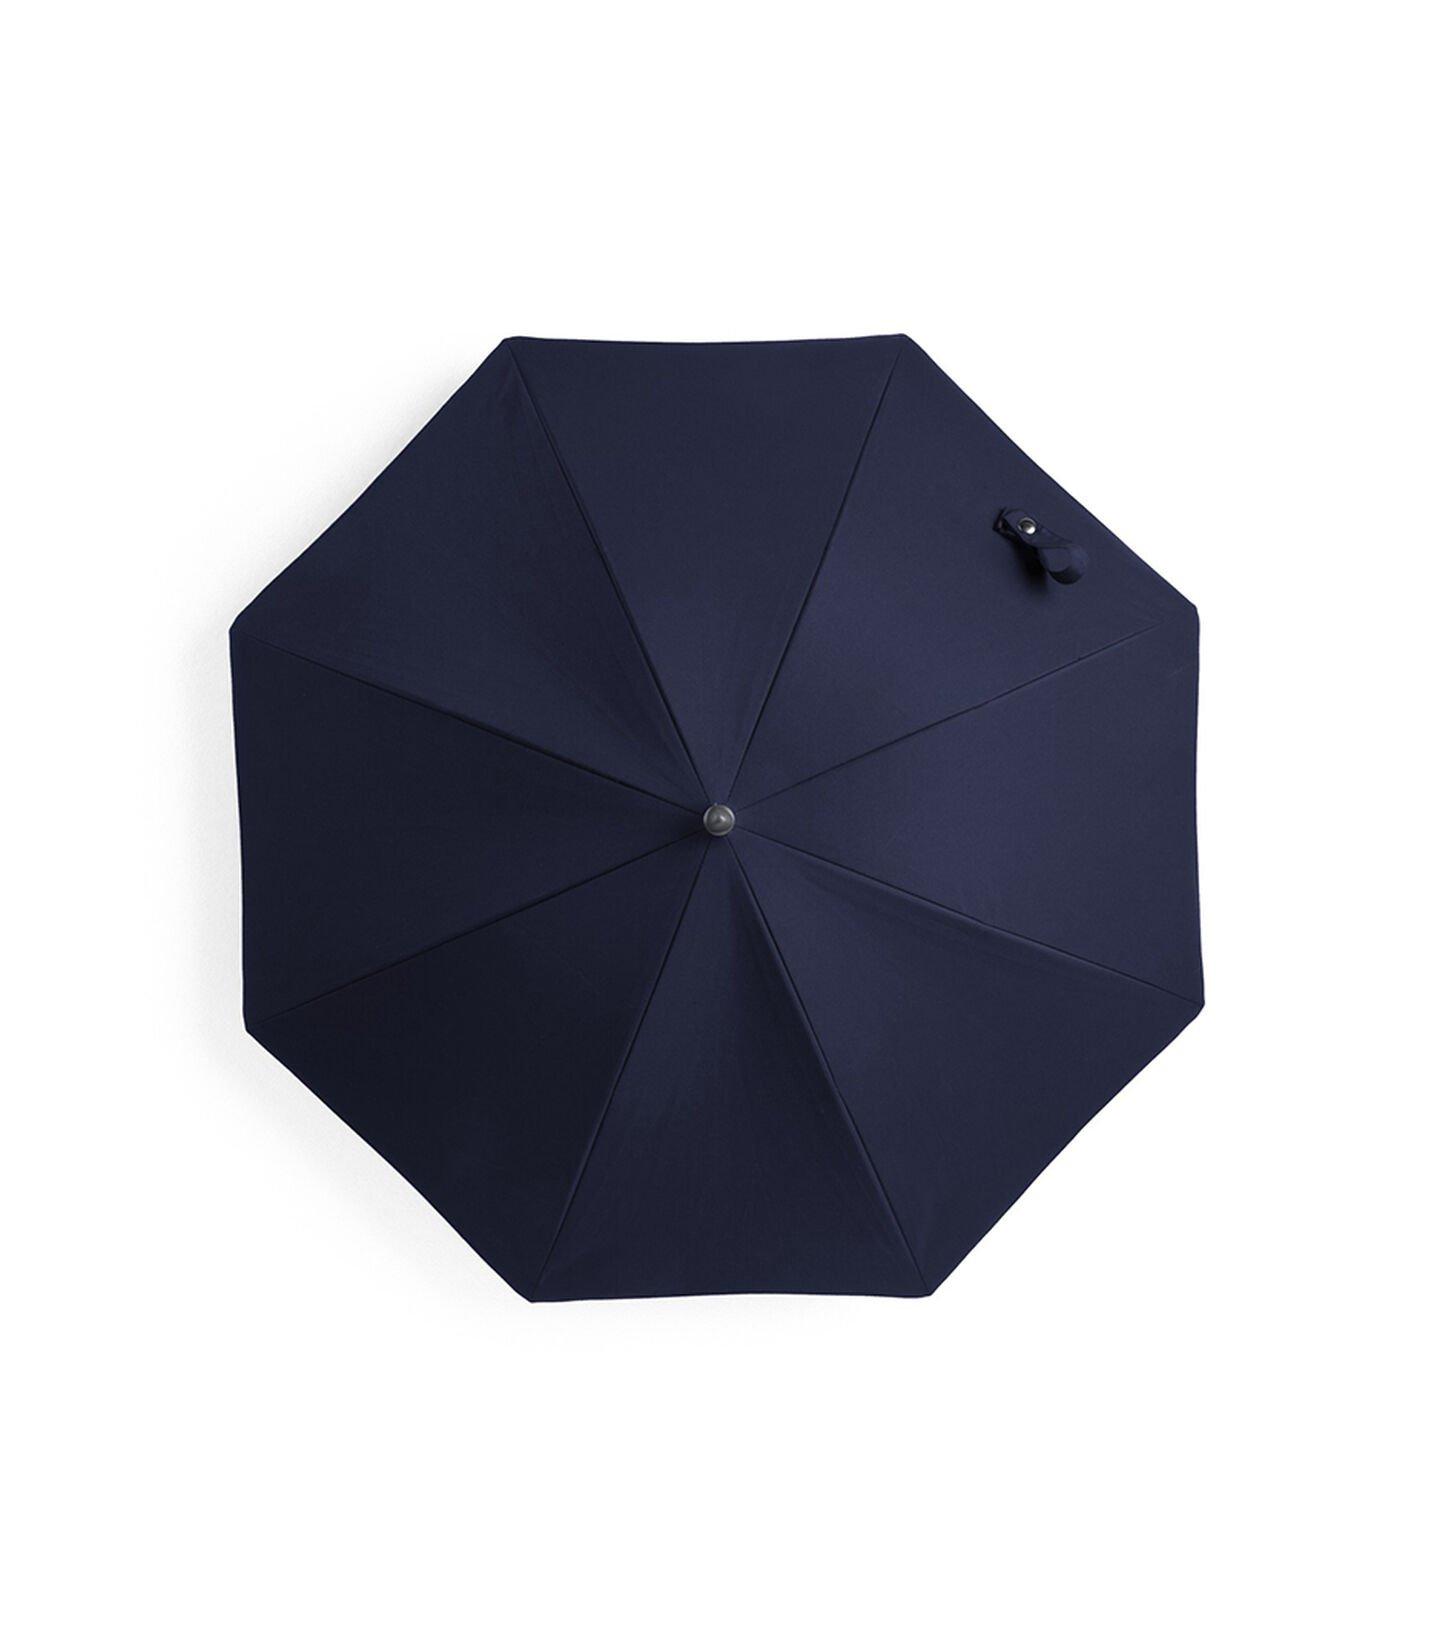 Stokke® Stroller Black Parasol Deep Blue, Azul Noche, mainview view 2